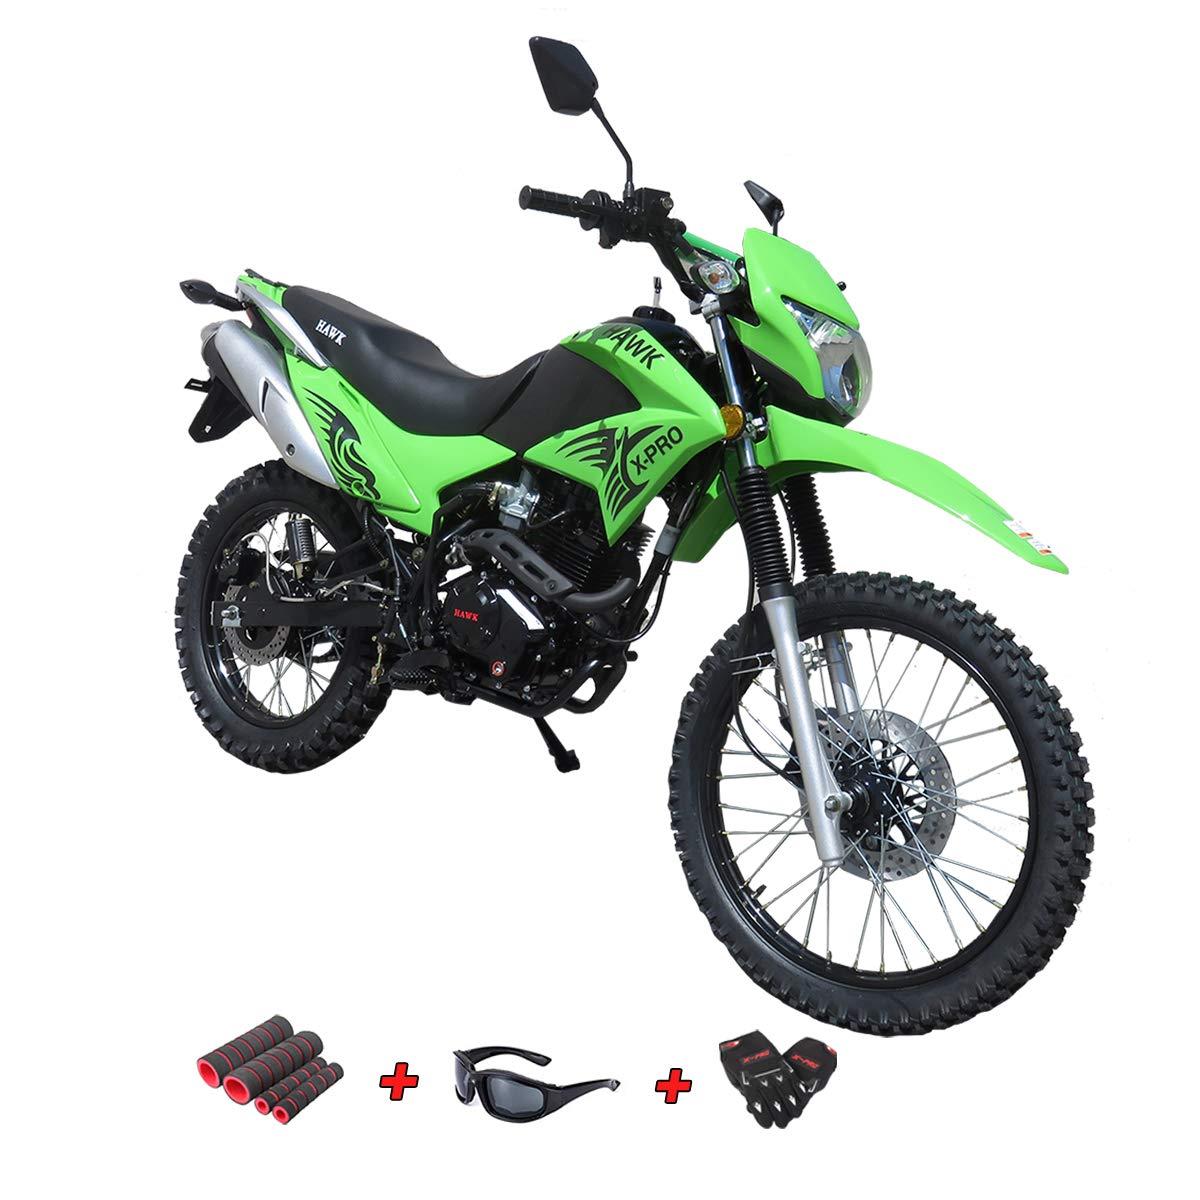 250cc Dirt Bike Hawk 250 Enduro Street Bike Motorcycle Bike with Gloves, Sunglasses and Handgrip (Black)